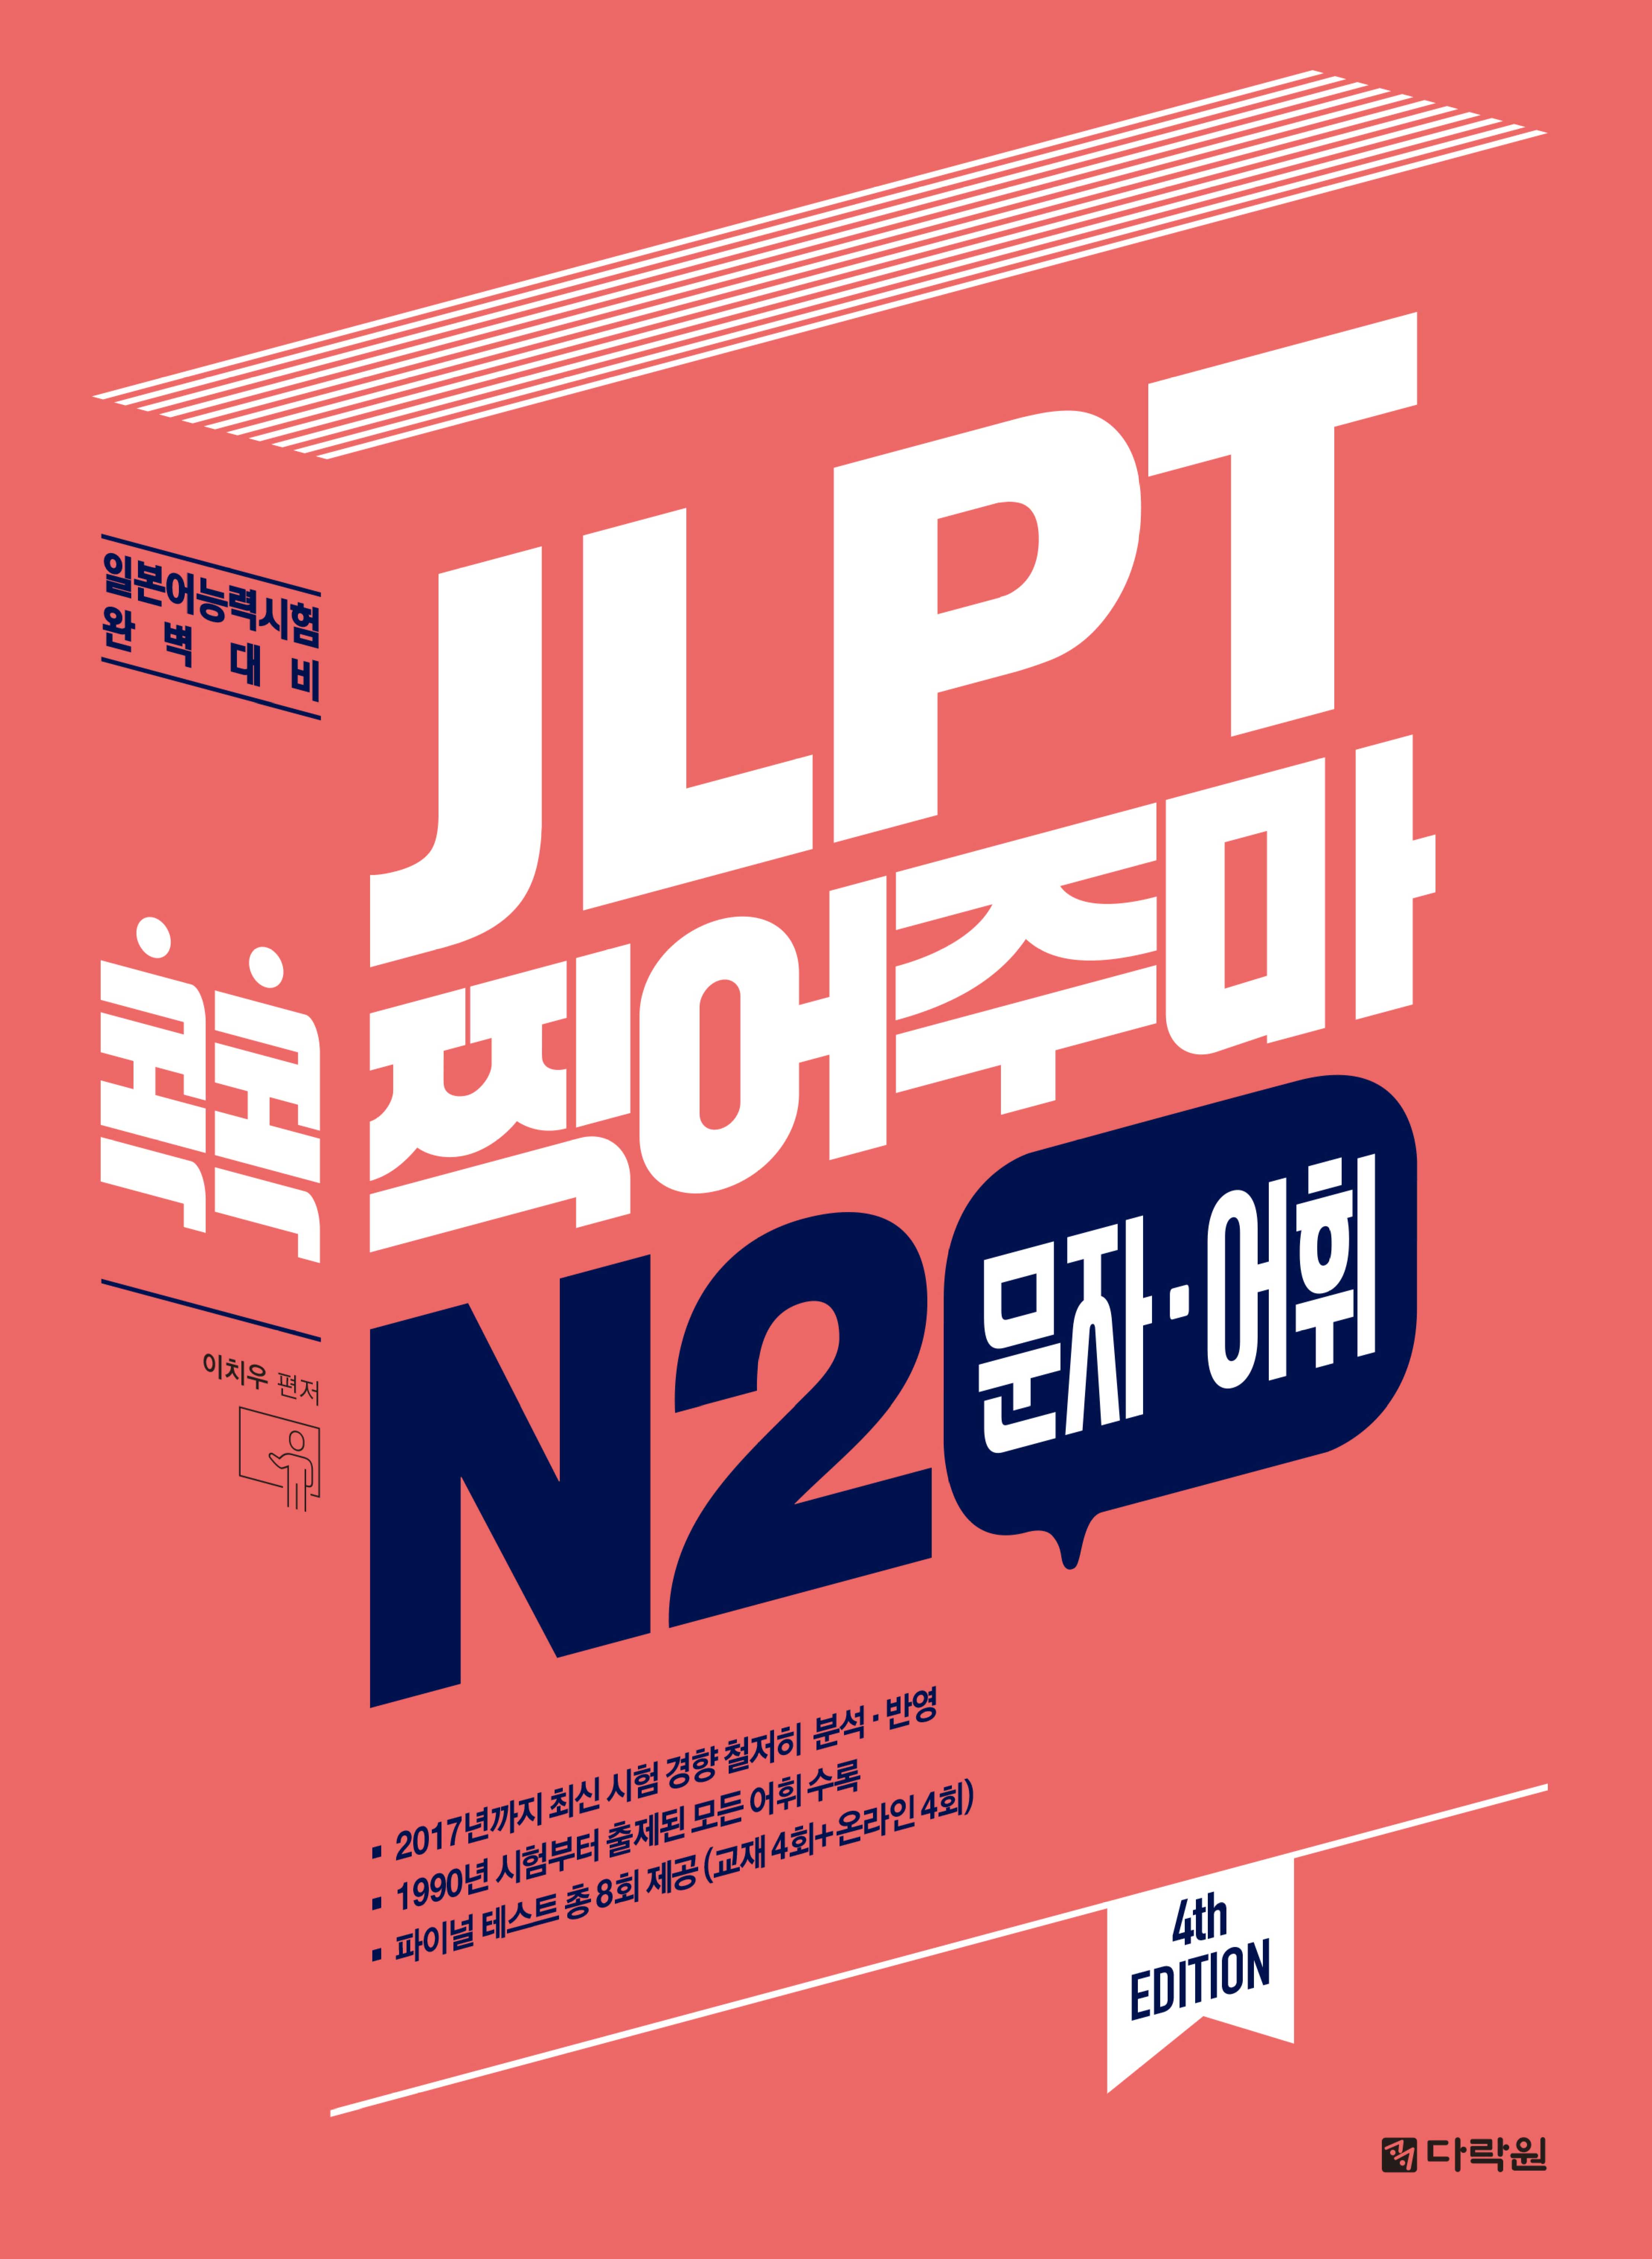 [JLPT 콕콕 찍어주마] (4th EDITION) JLPT 콕콕 찍어주마 N2 문자·어휘